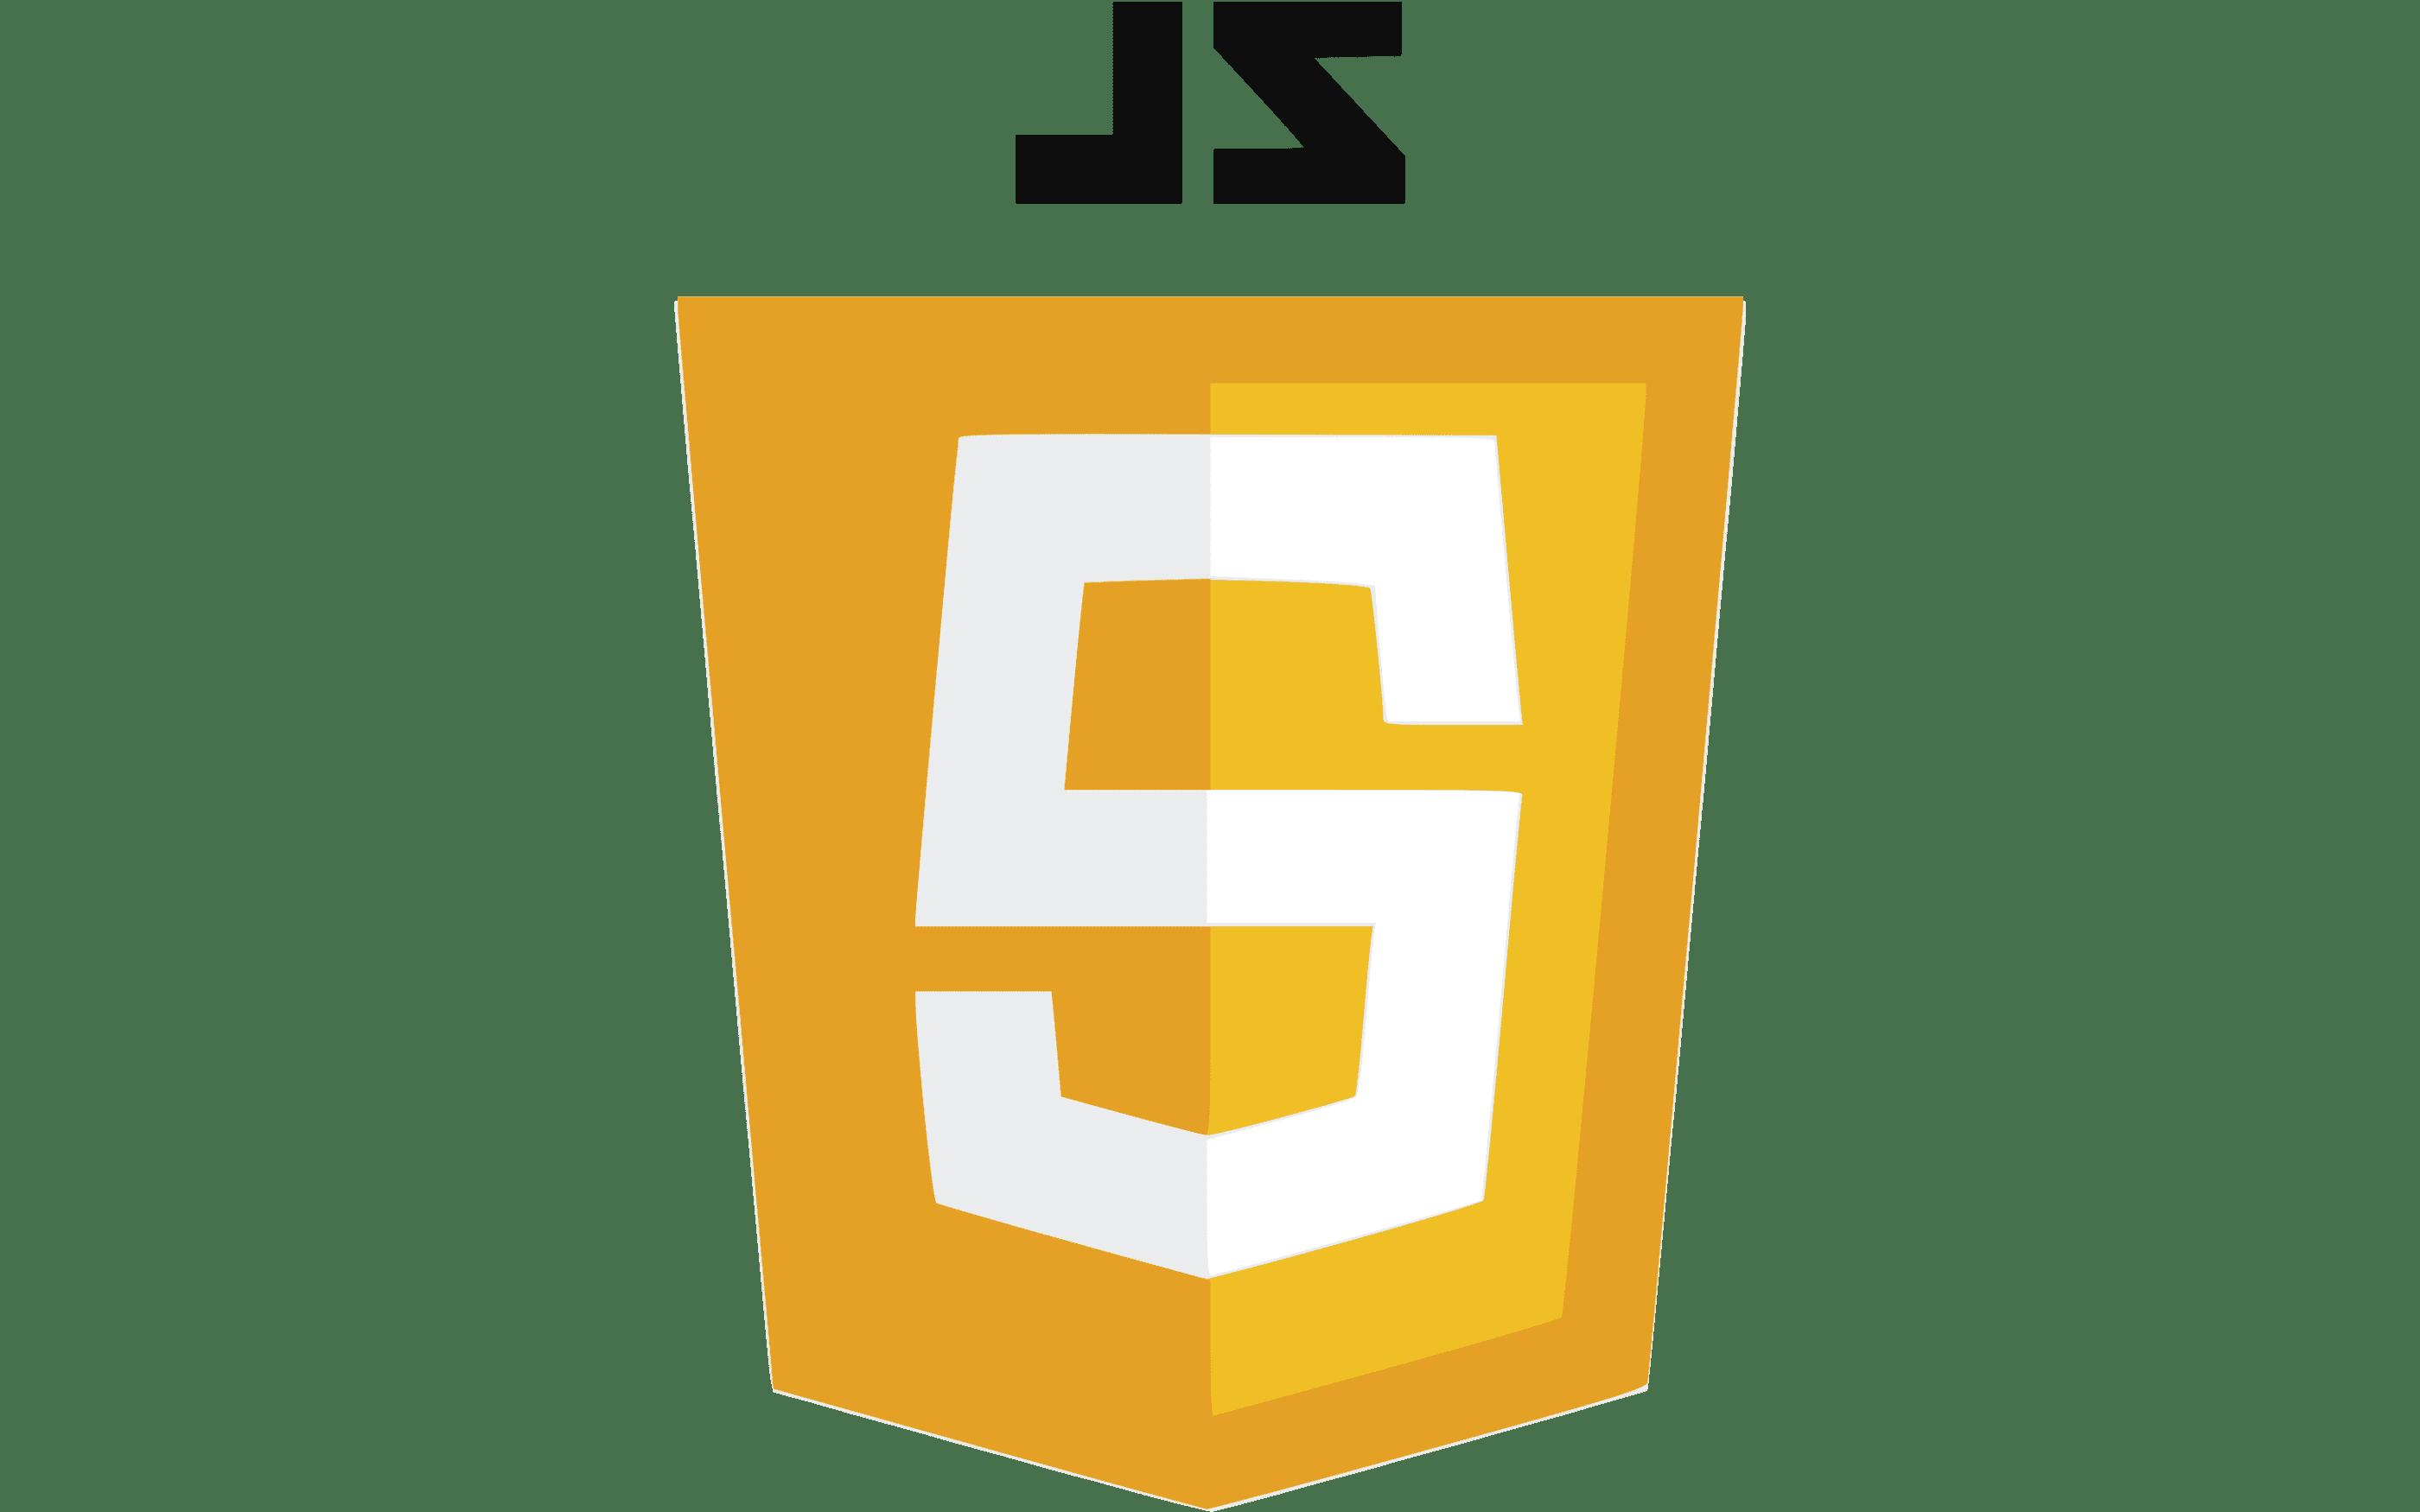 Logo JavaScript valor, história, png, vector